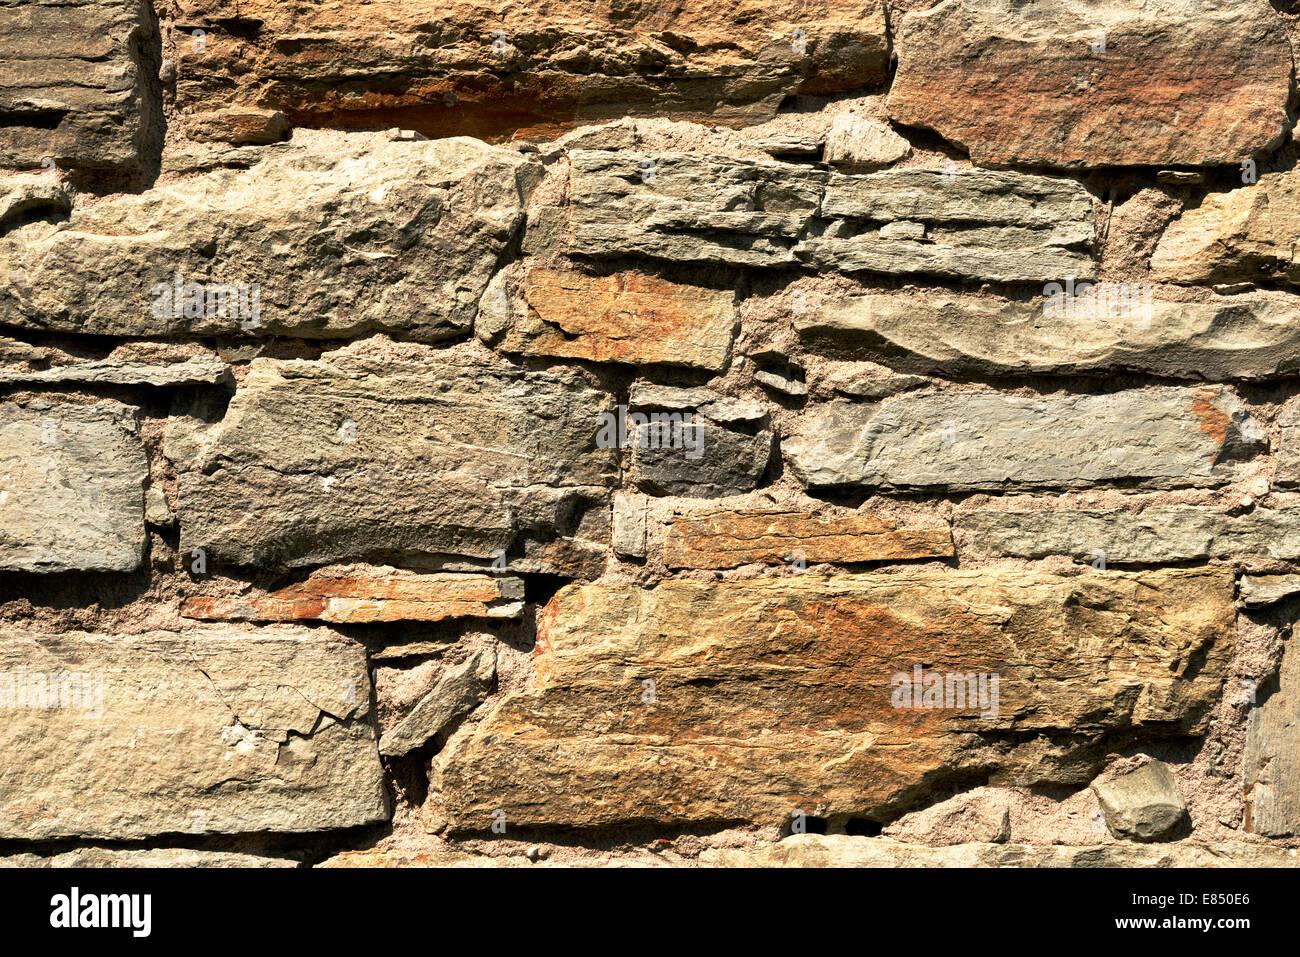 Old wall of reddish stones - Stock Image